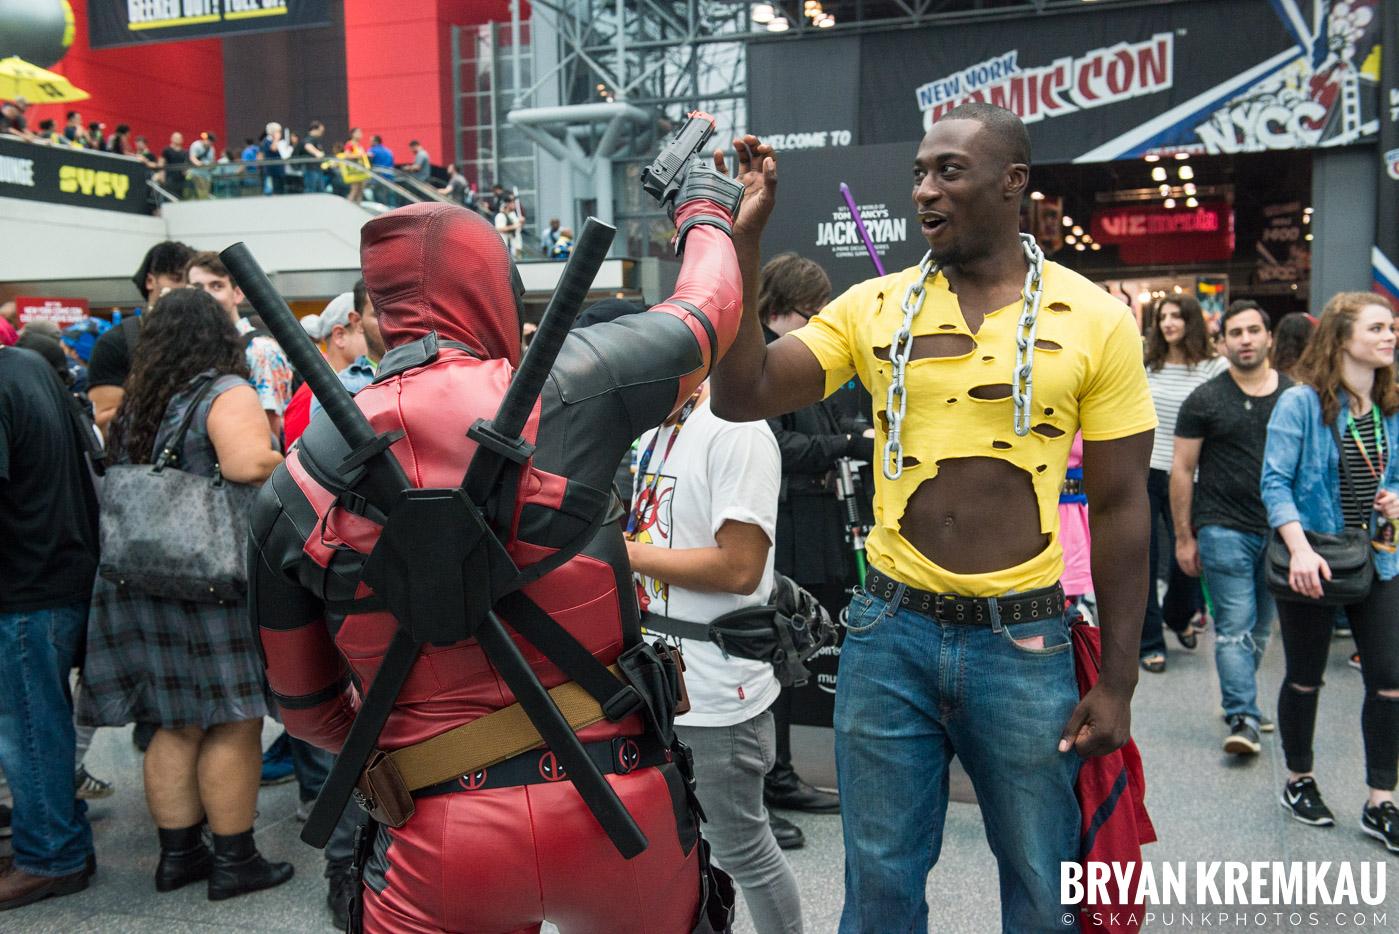 New York Comic Con 2017: Sunday – 10.8.17 (5)